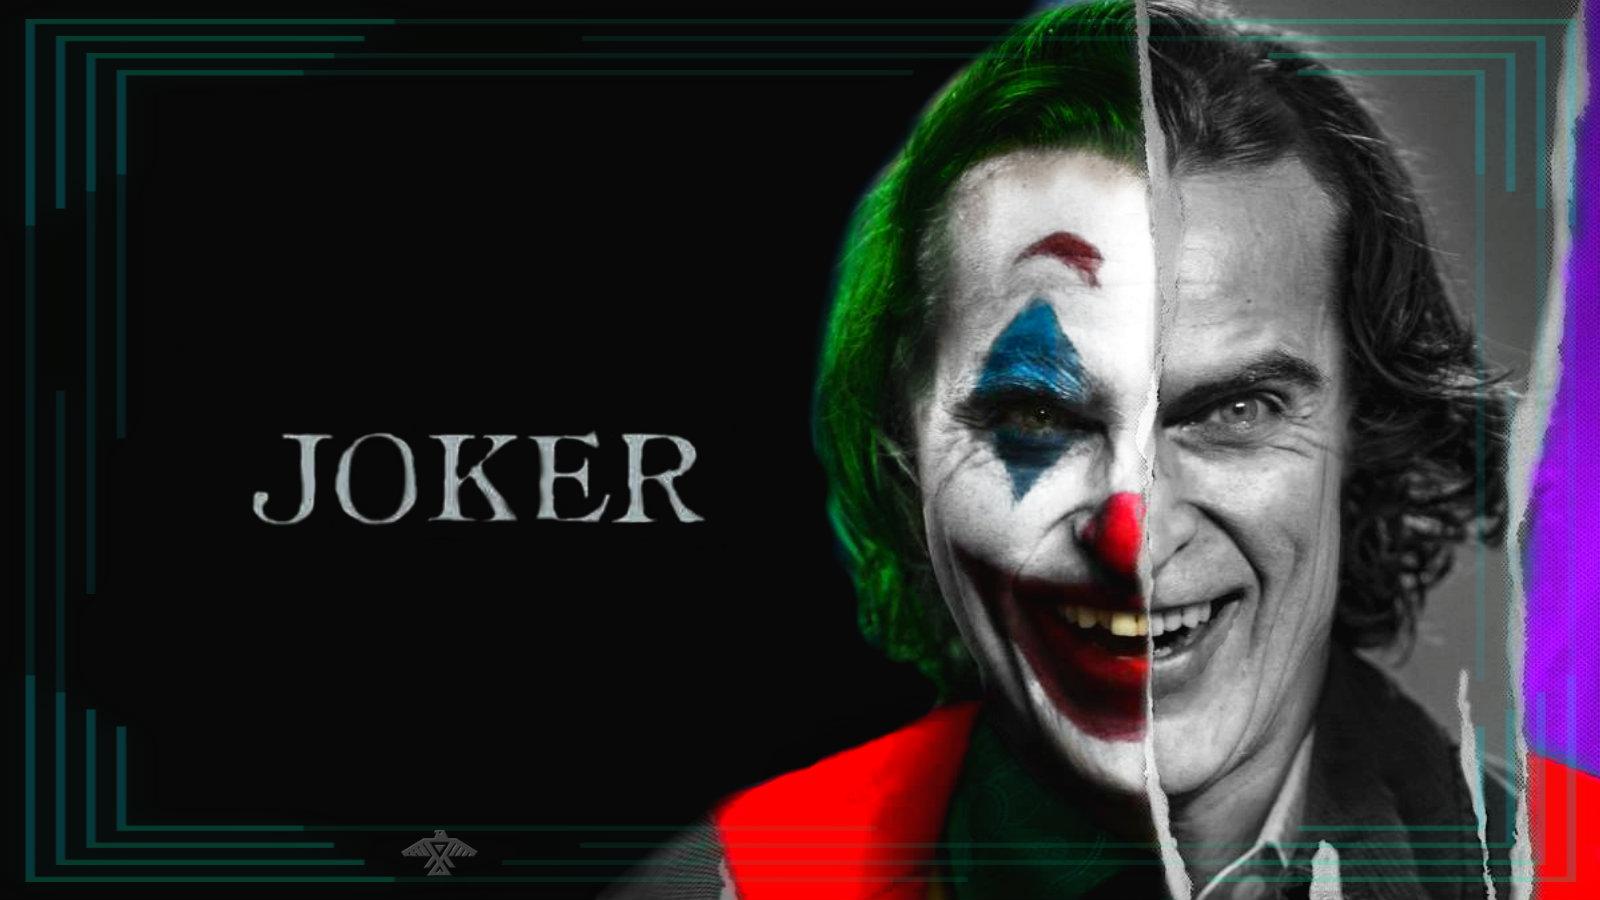 Arthur Fleck/Joker (2019)